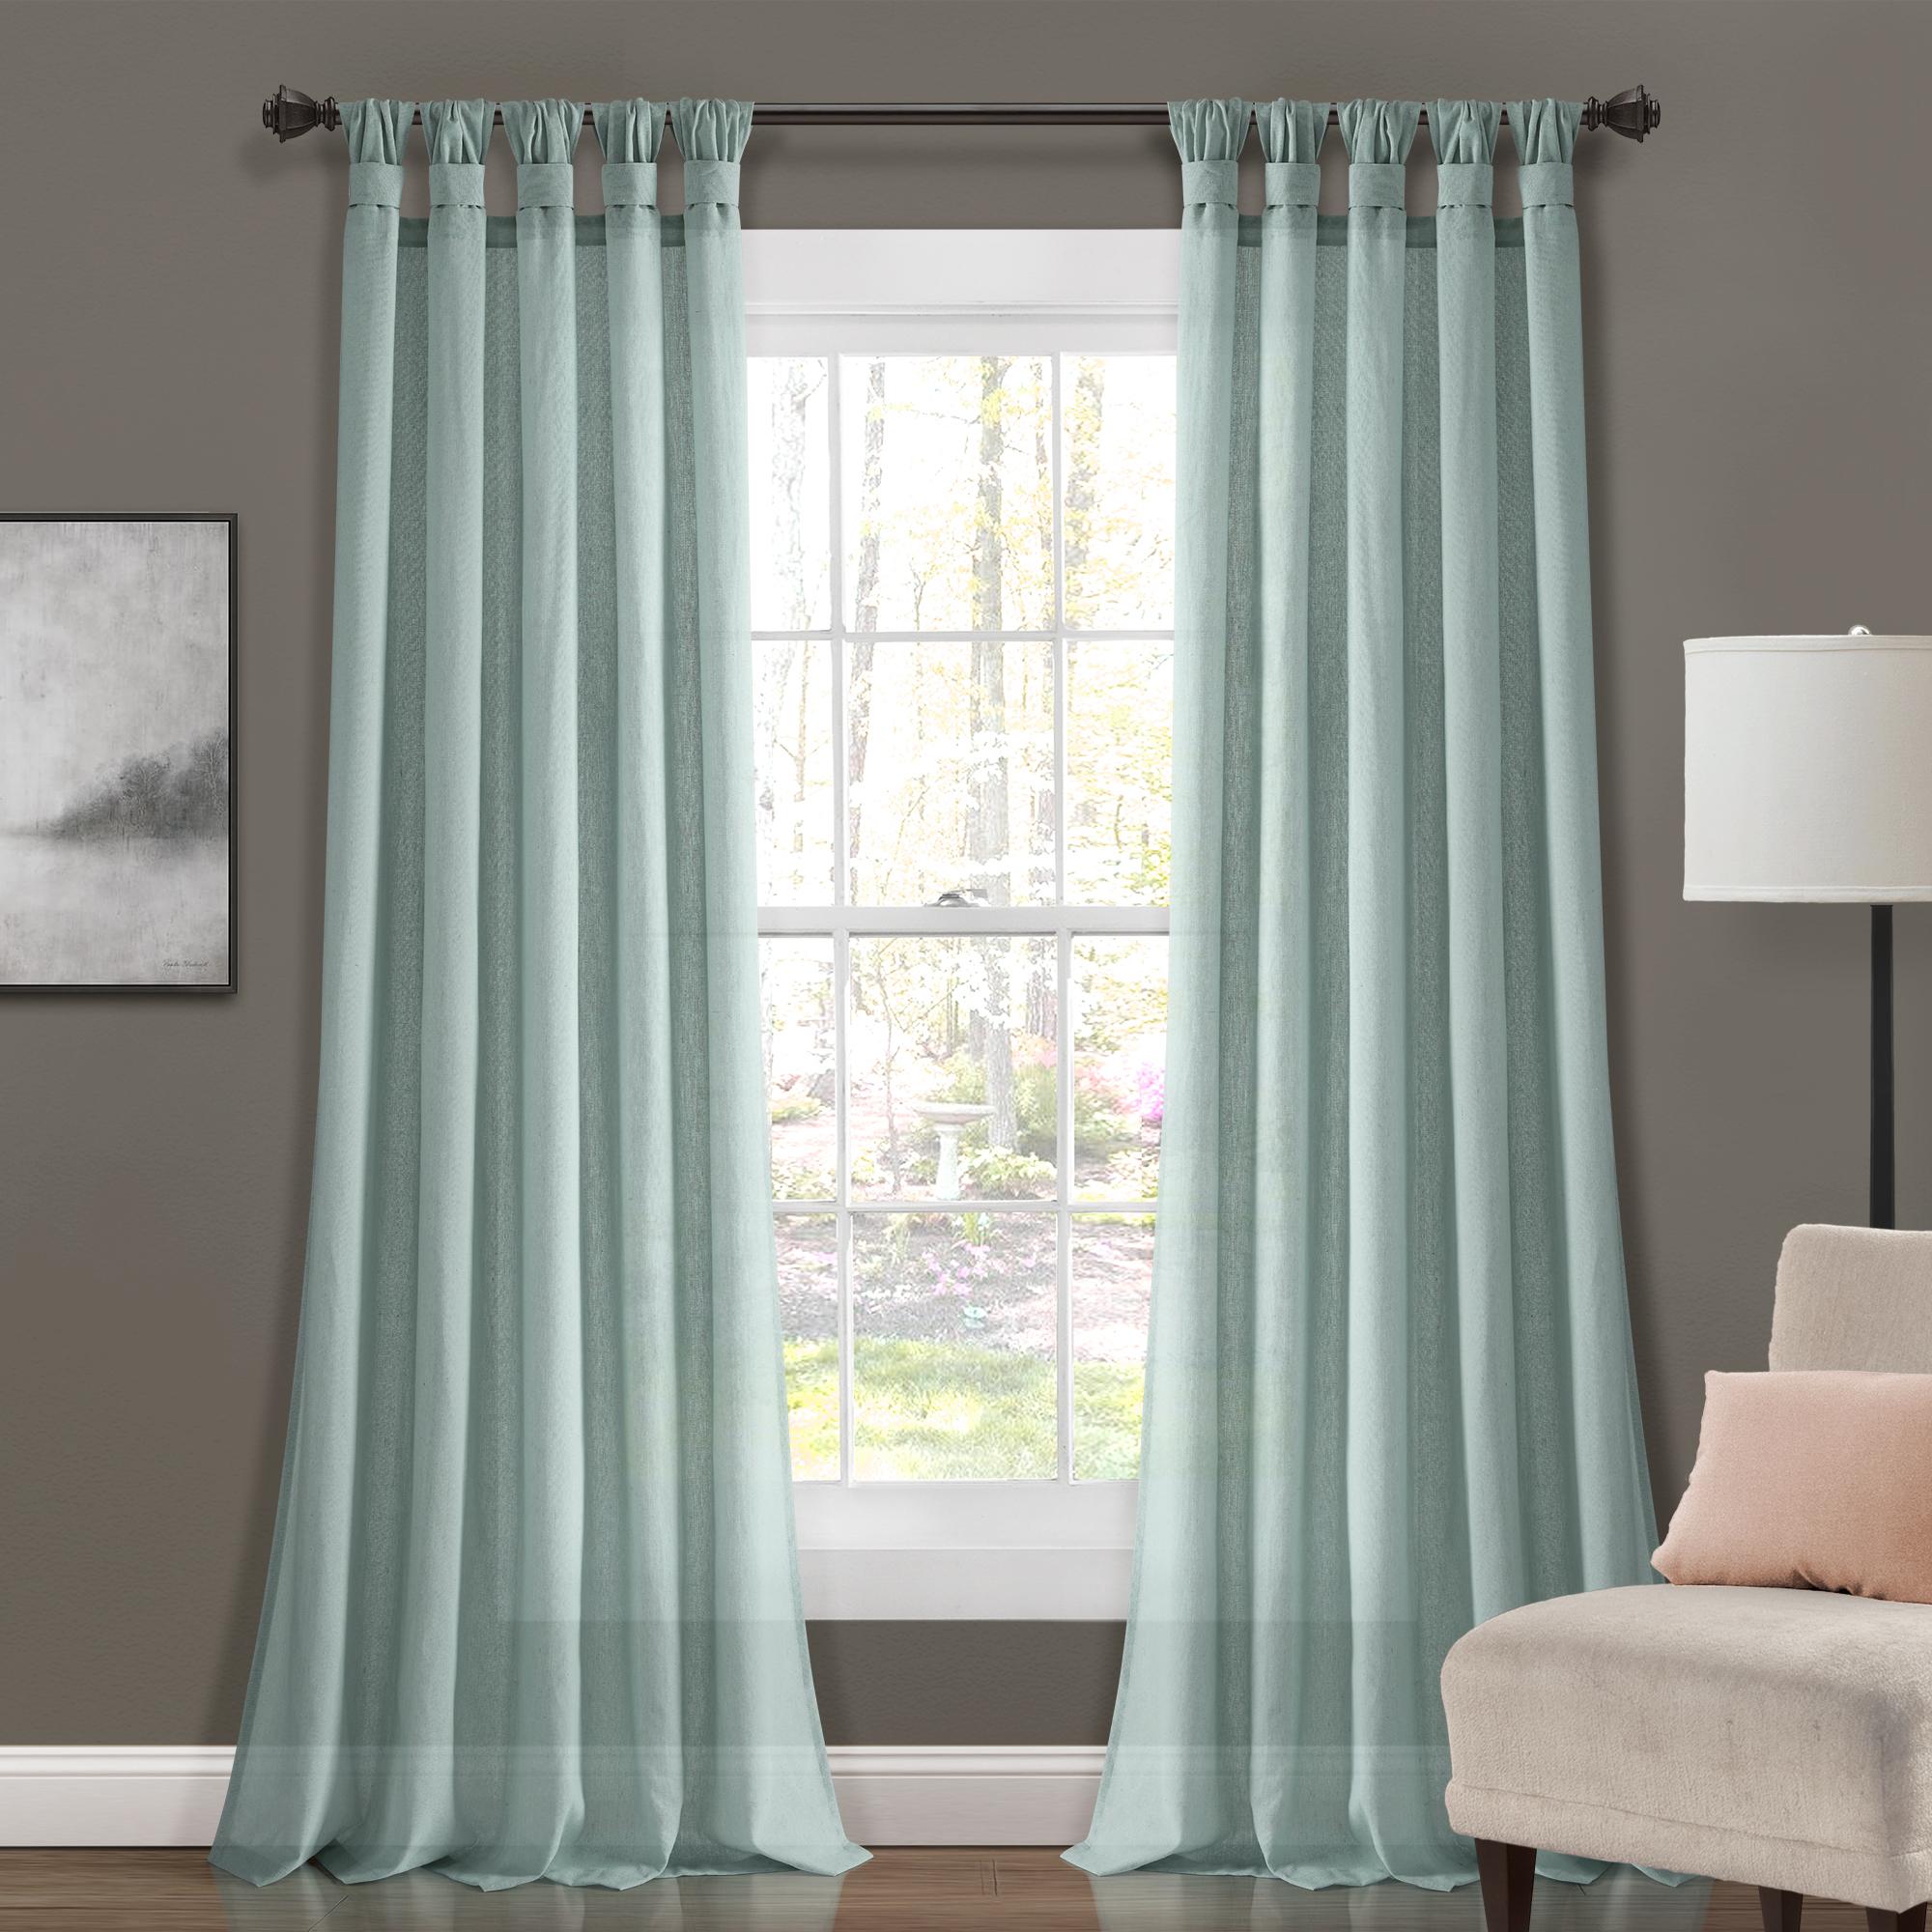 Burlap Knotted Tab Top Window Curtain Pair Panels – Brickseek Within Fretwork Print Pattern Single Curtain Panels (View 20 of 20)